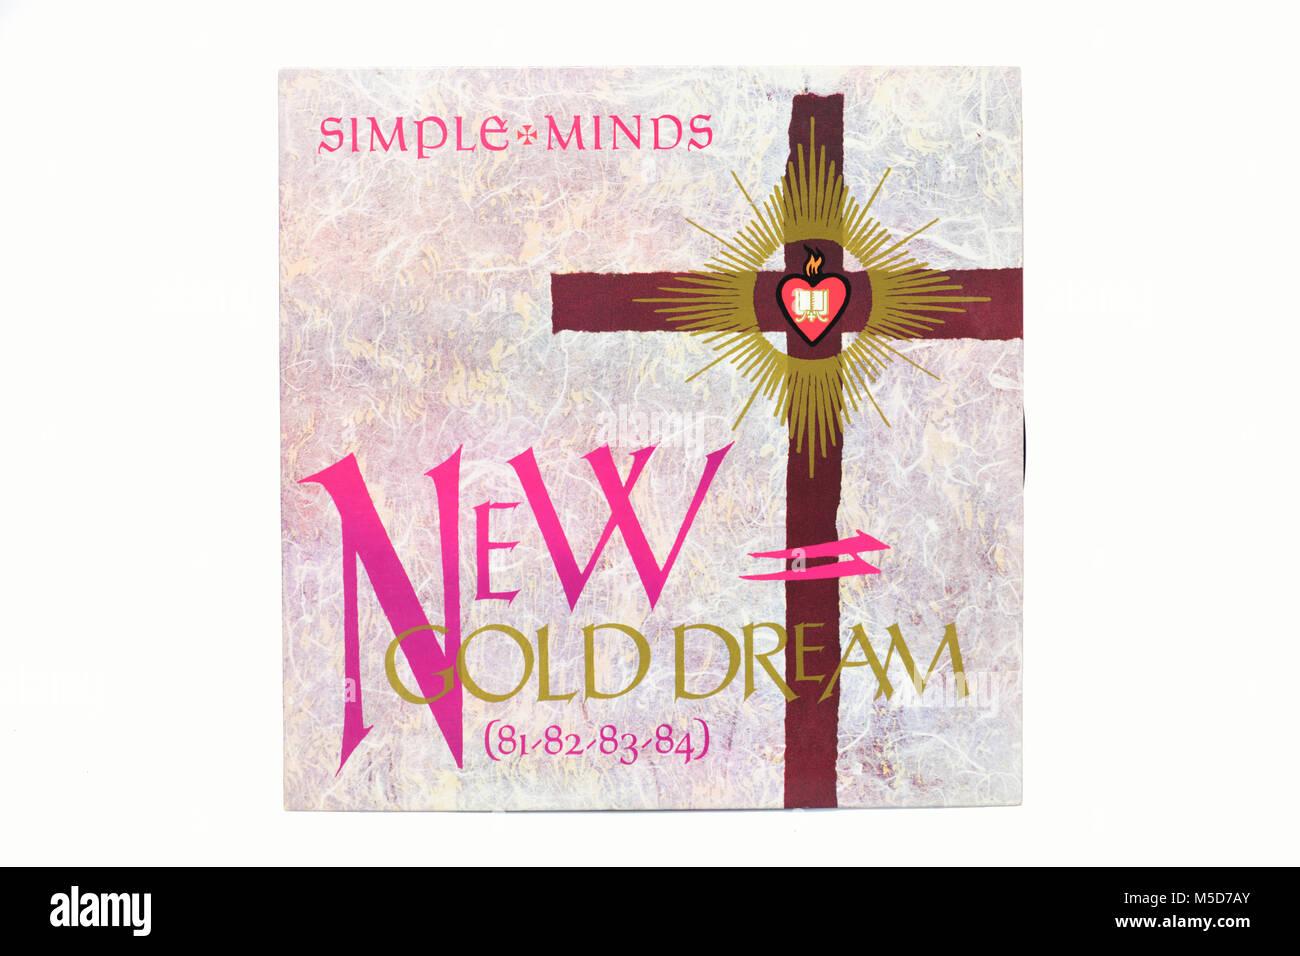 Simple Minds New Gold Dream LP music vinyl album cover art - Stock Image